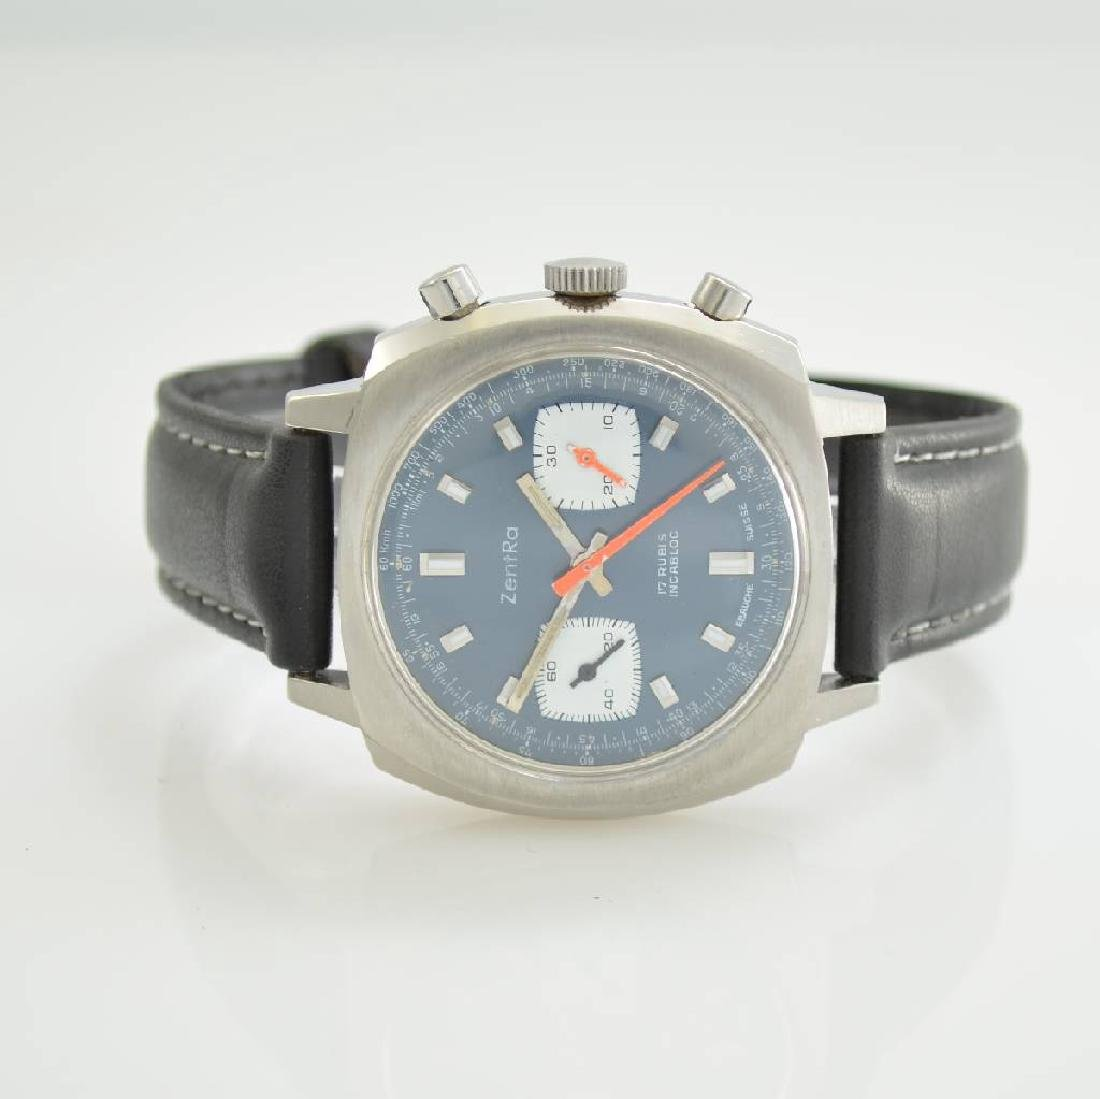 ZENTRA chronograph, Switzerland around 1970